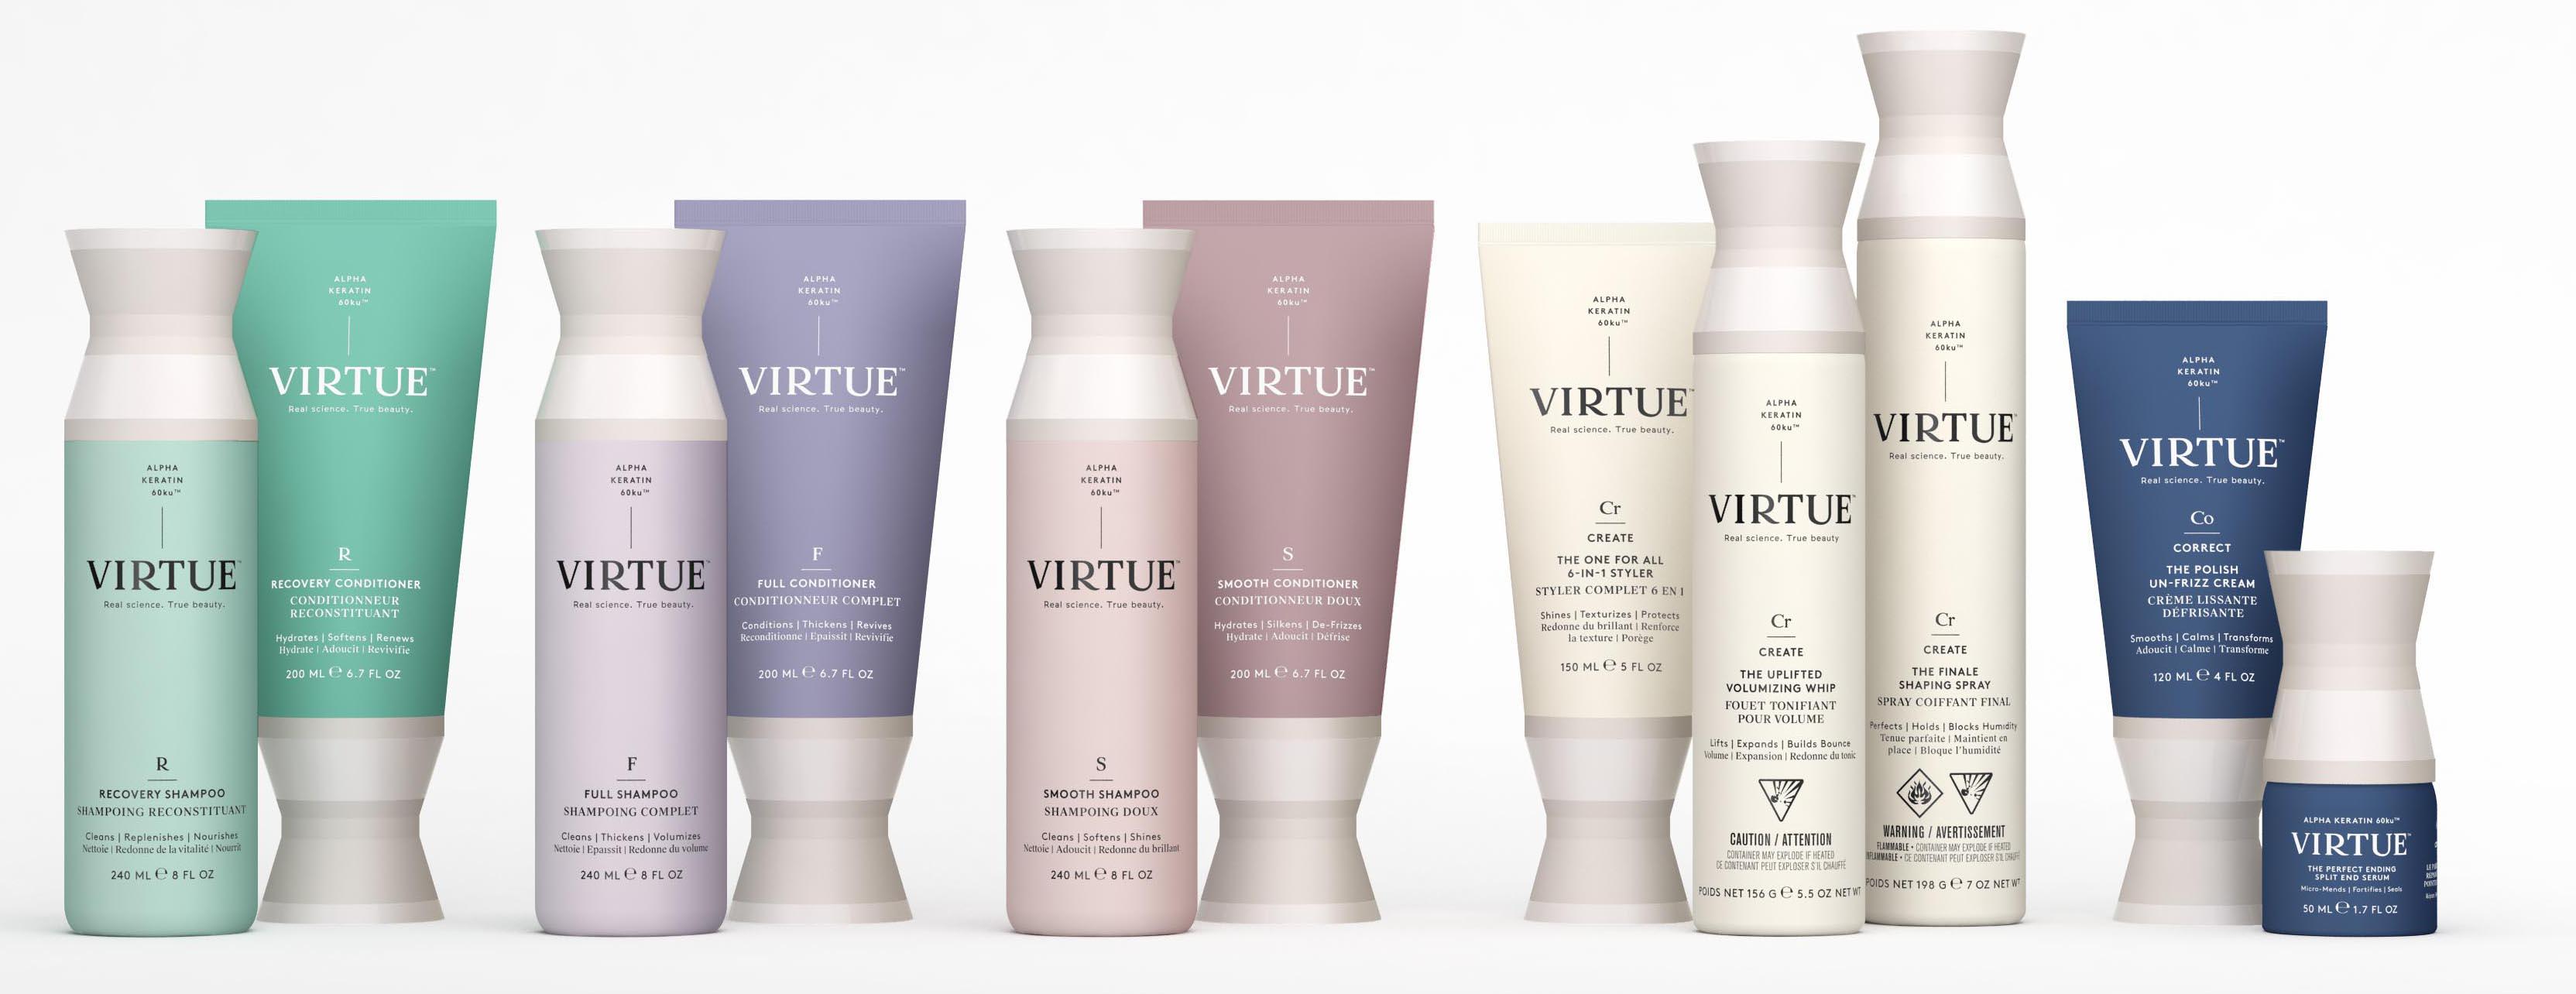 Virtue Announces Creative Director Adir Abergel